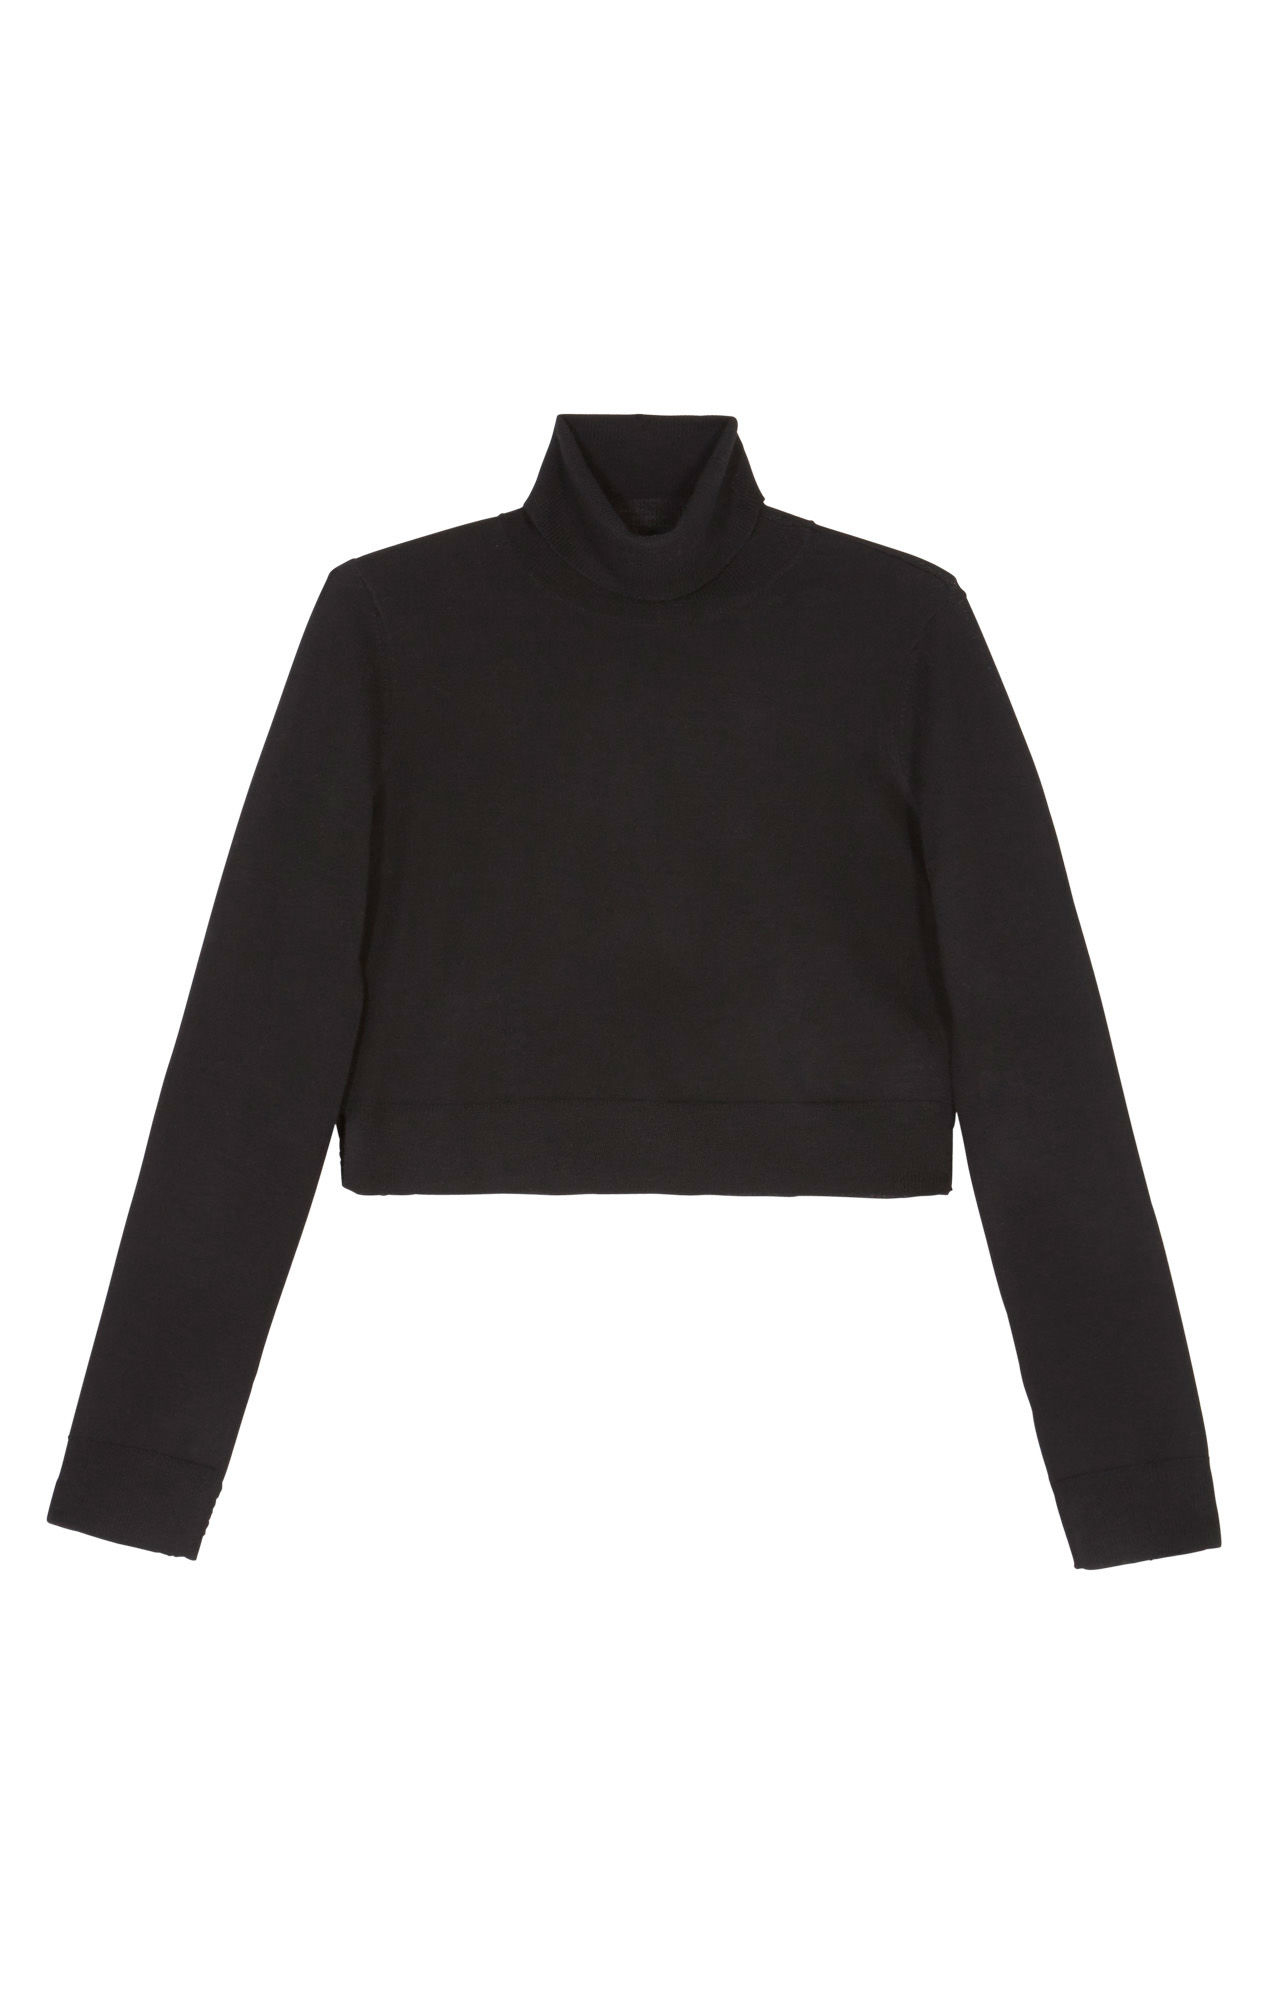 cbab891973a BCBGMAXAZRIA Natassia Cropped Turtleneck Wool Sweater in Black - Lyst